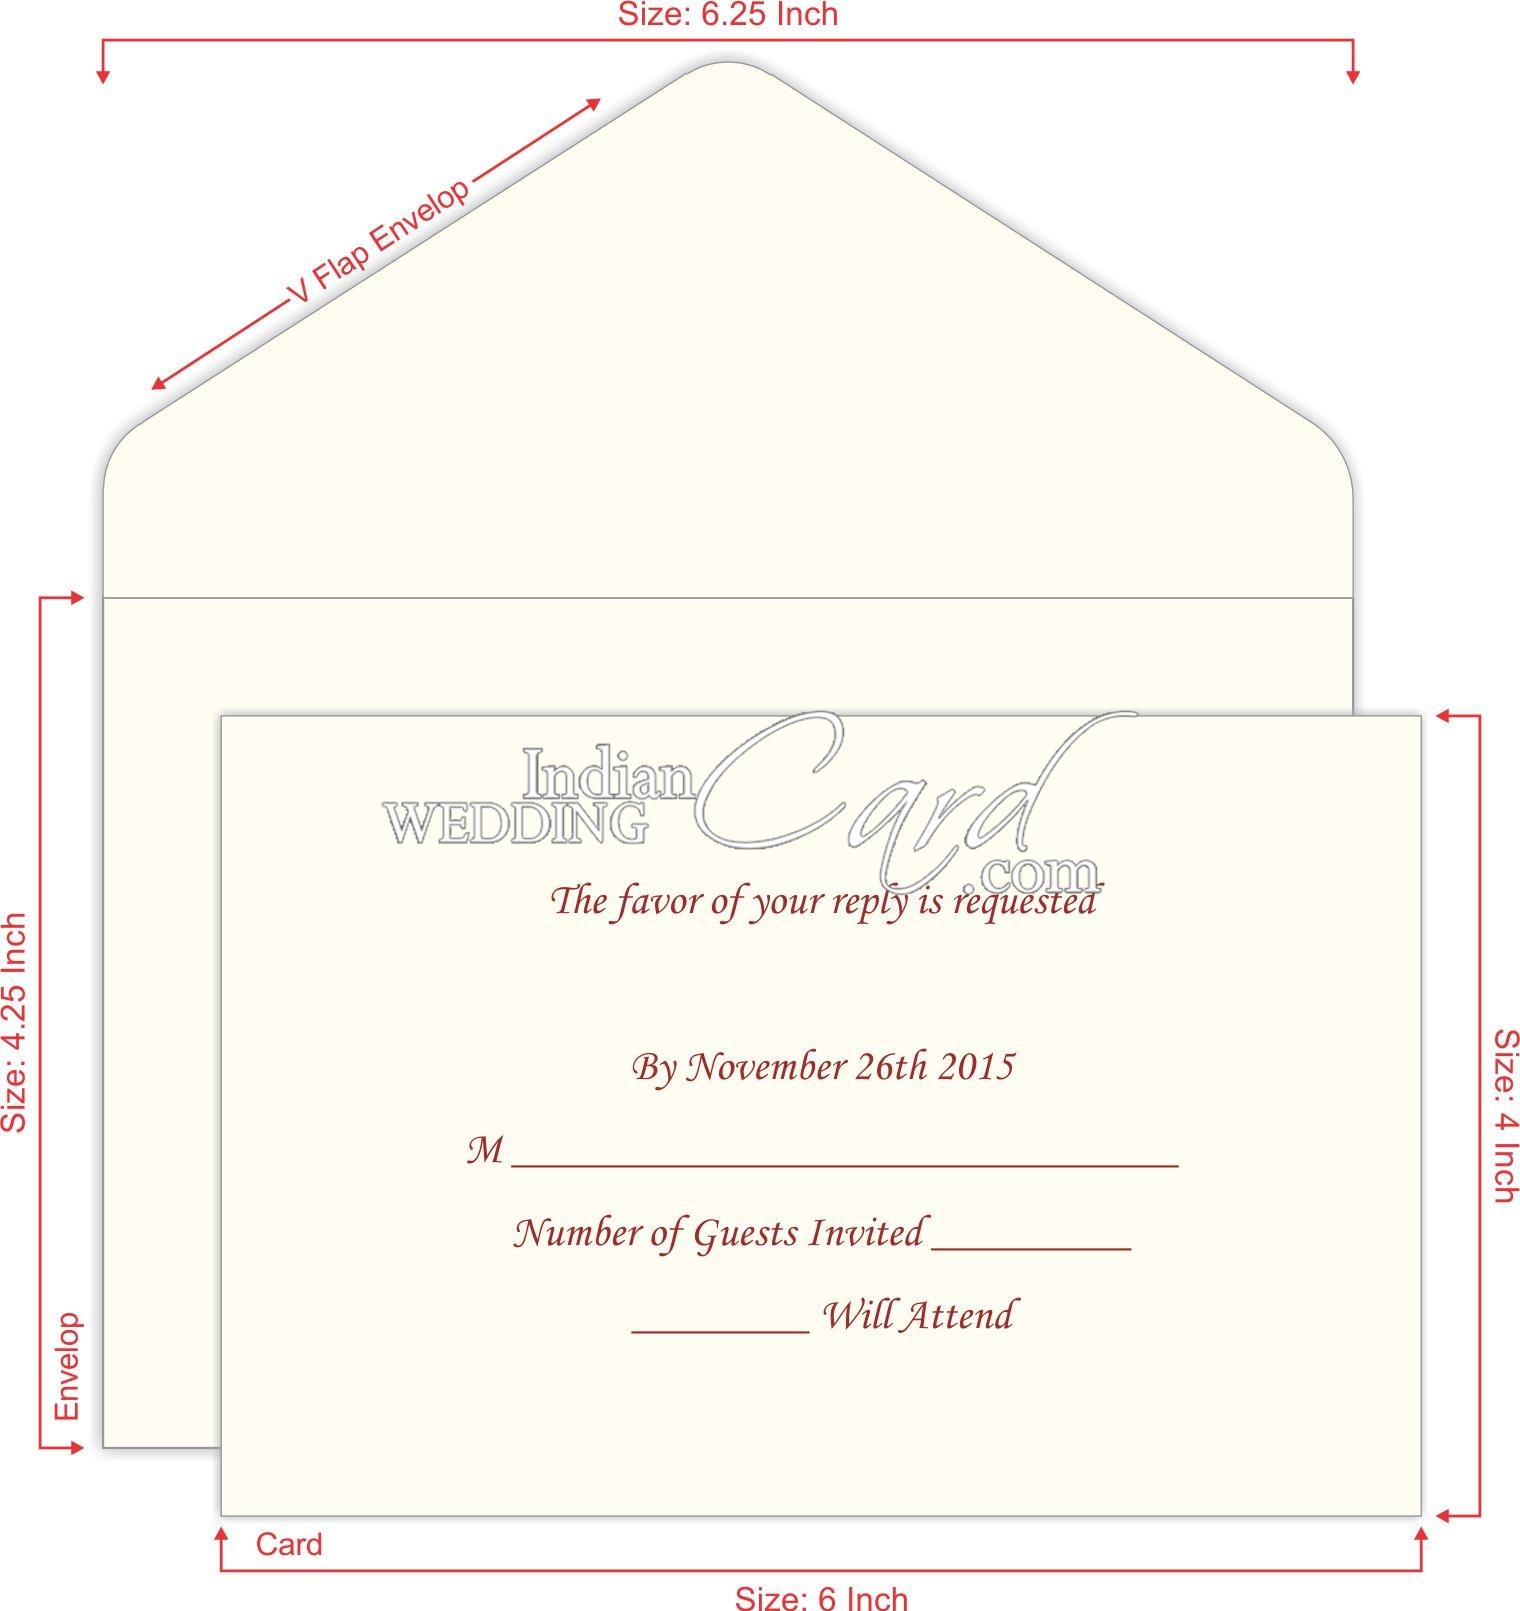 RSVP Invitations